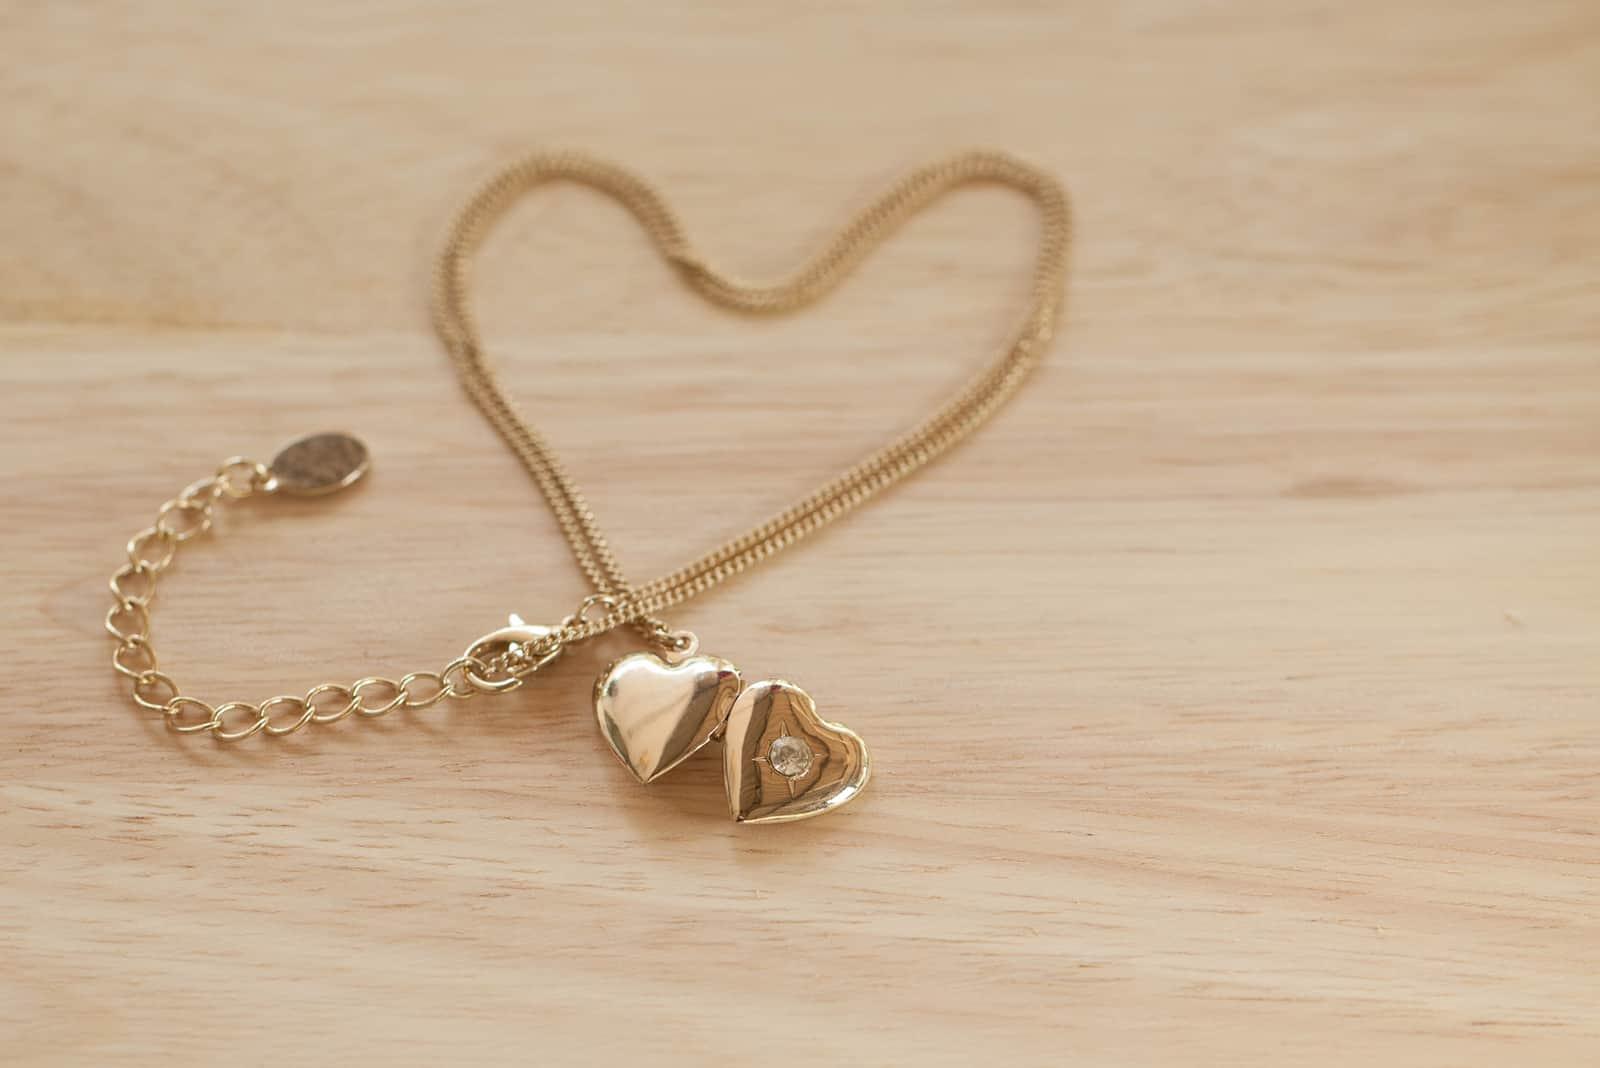 Herzform Gold Halskette